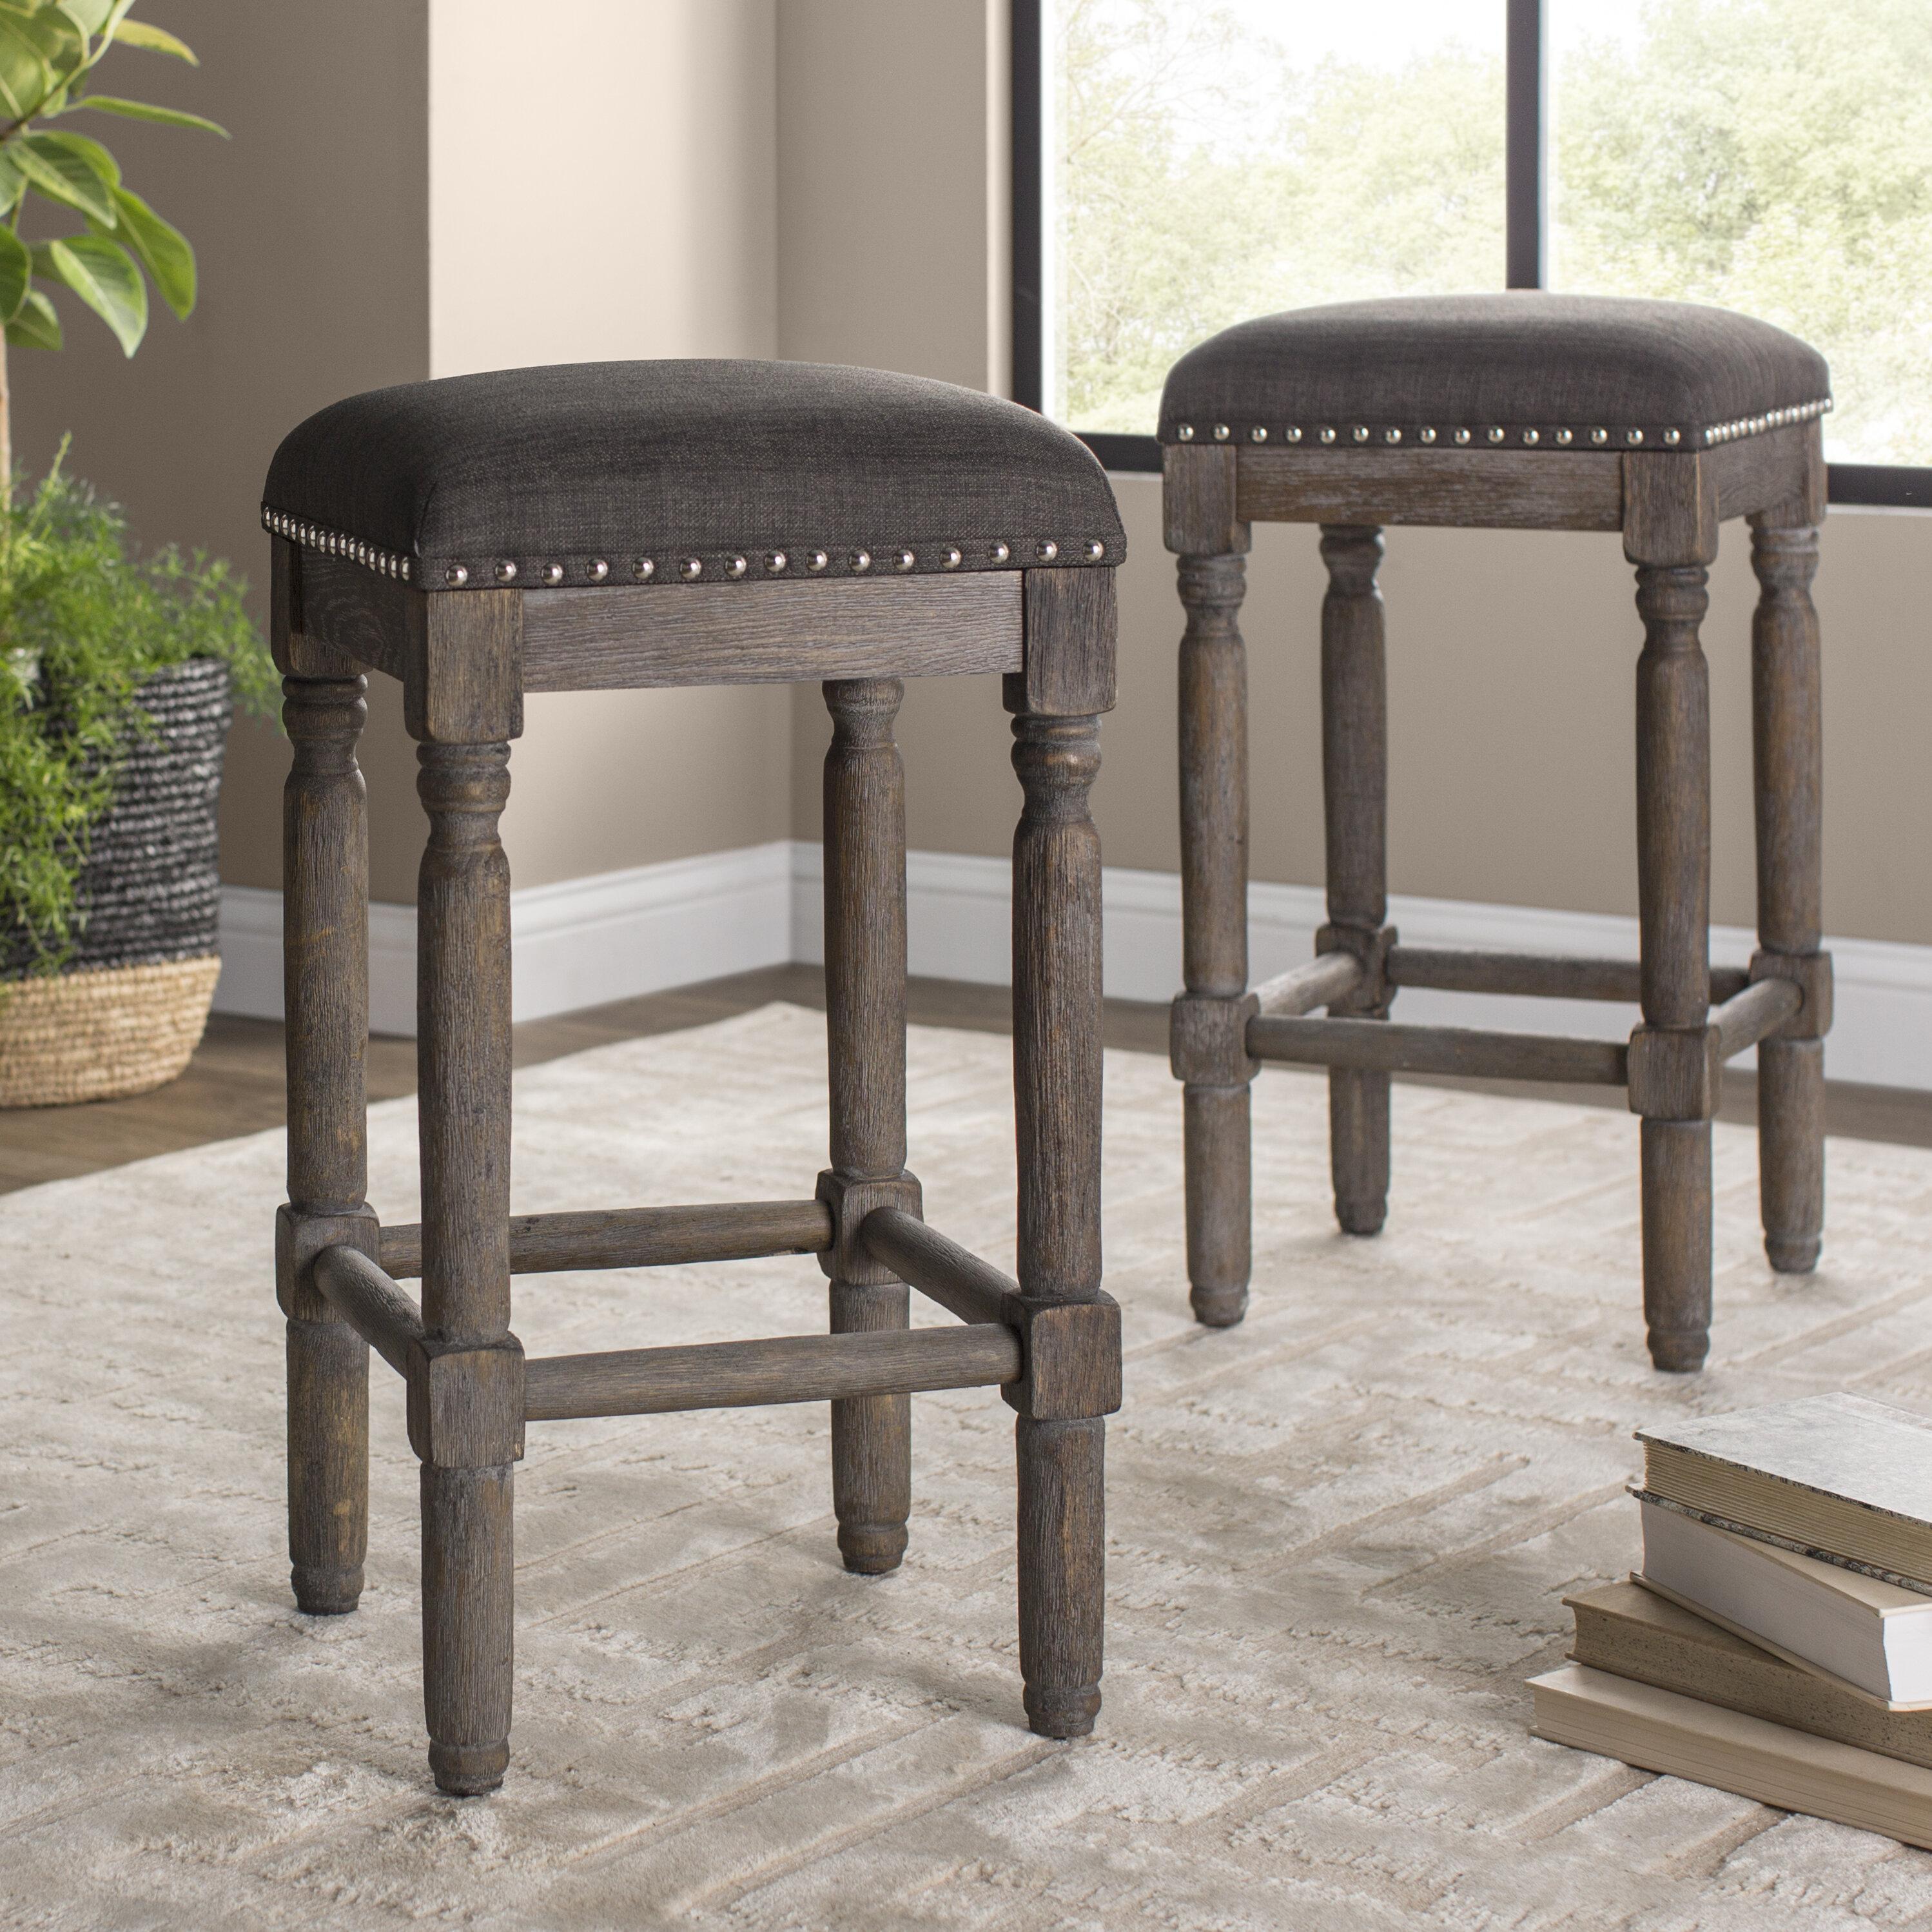 Tremendous Remy 26 Bar Stool Spiritservingveterans Wood Chair Design Ideas Spiritservingveteransorg